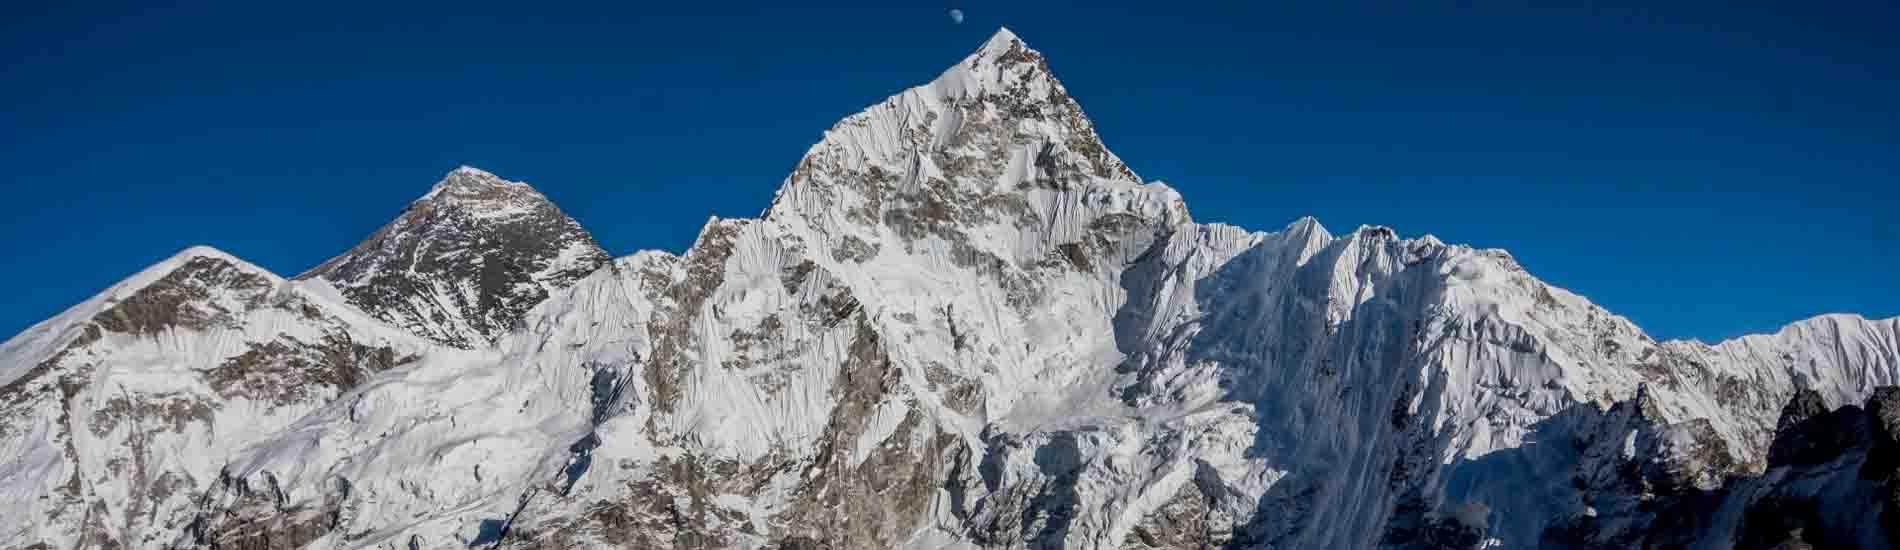 Gokyo Treks organized Everest base camp trek